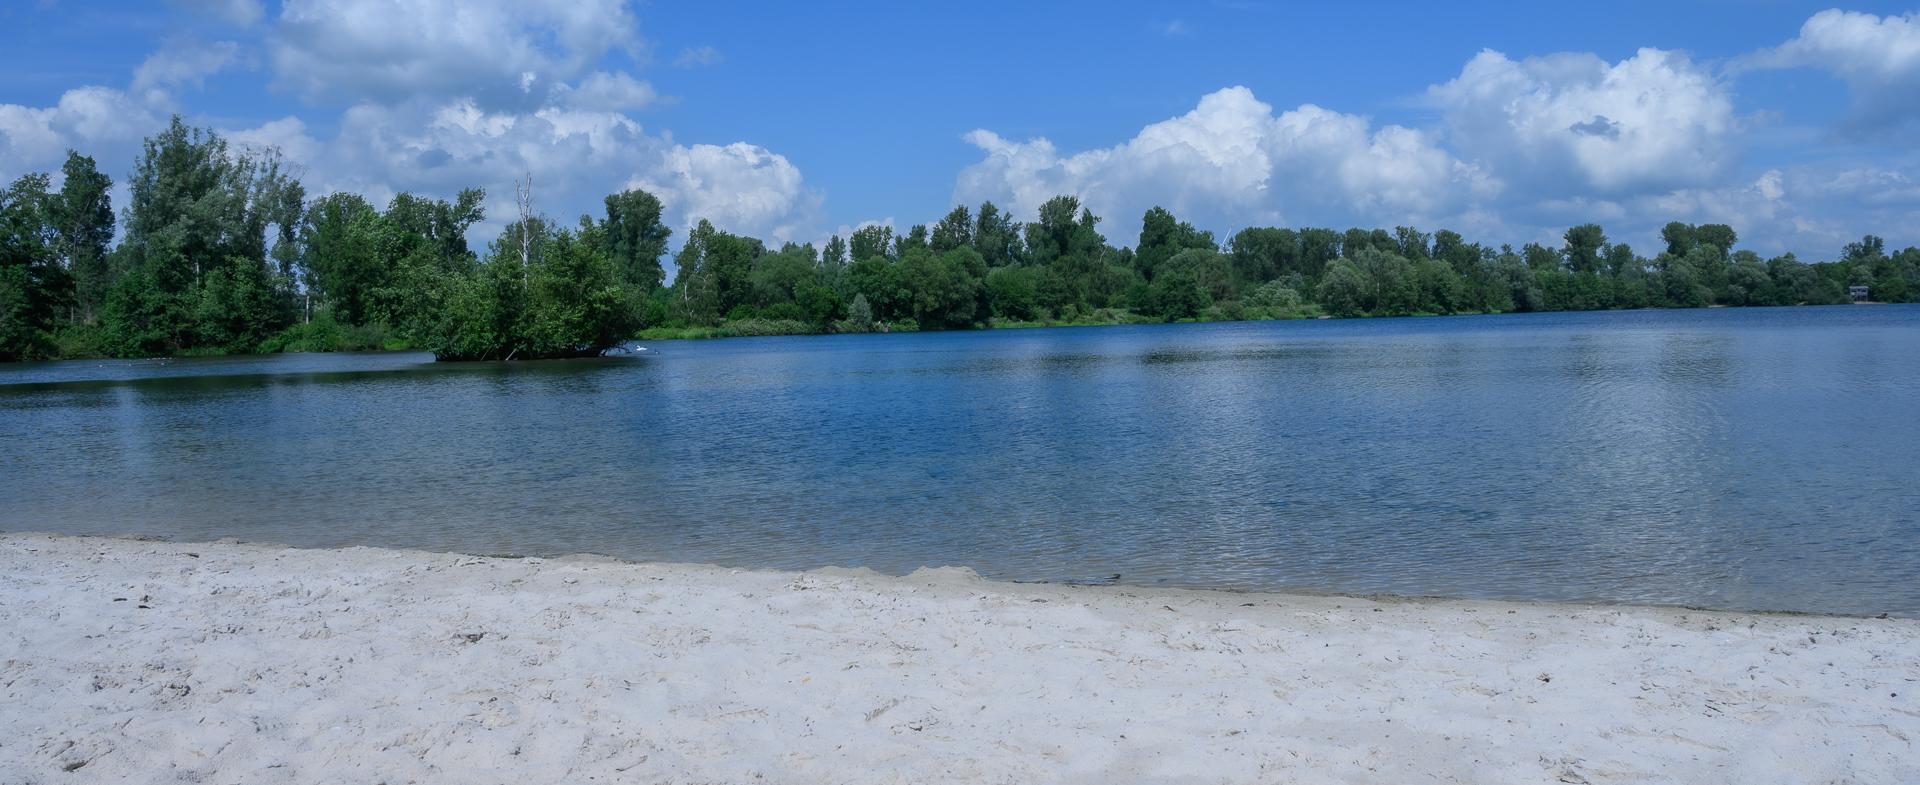 Barmener See